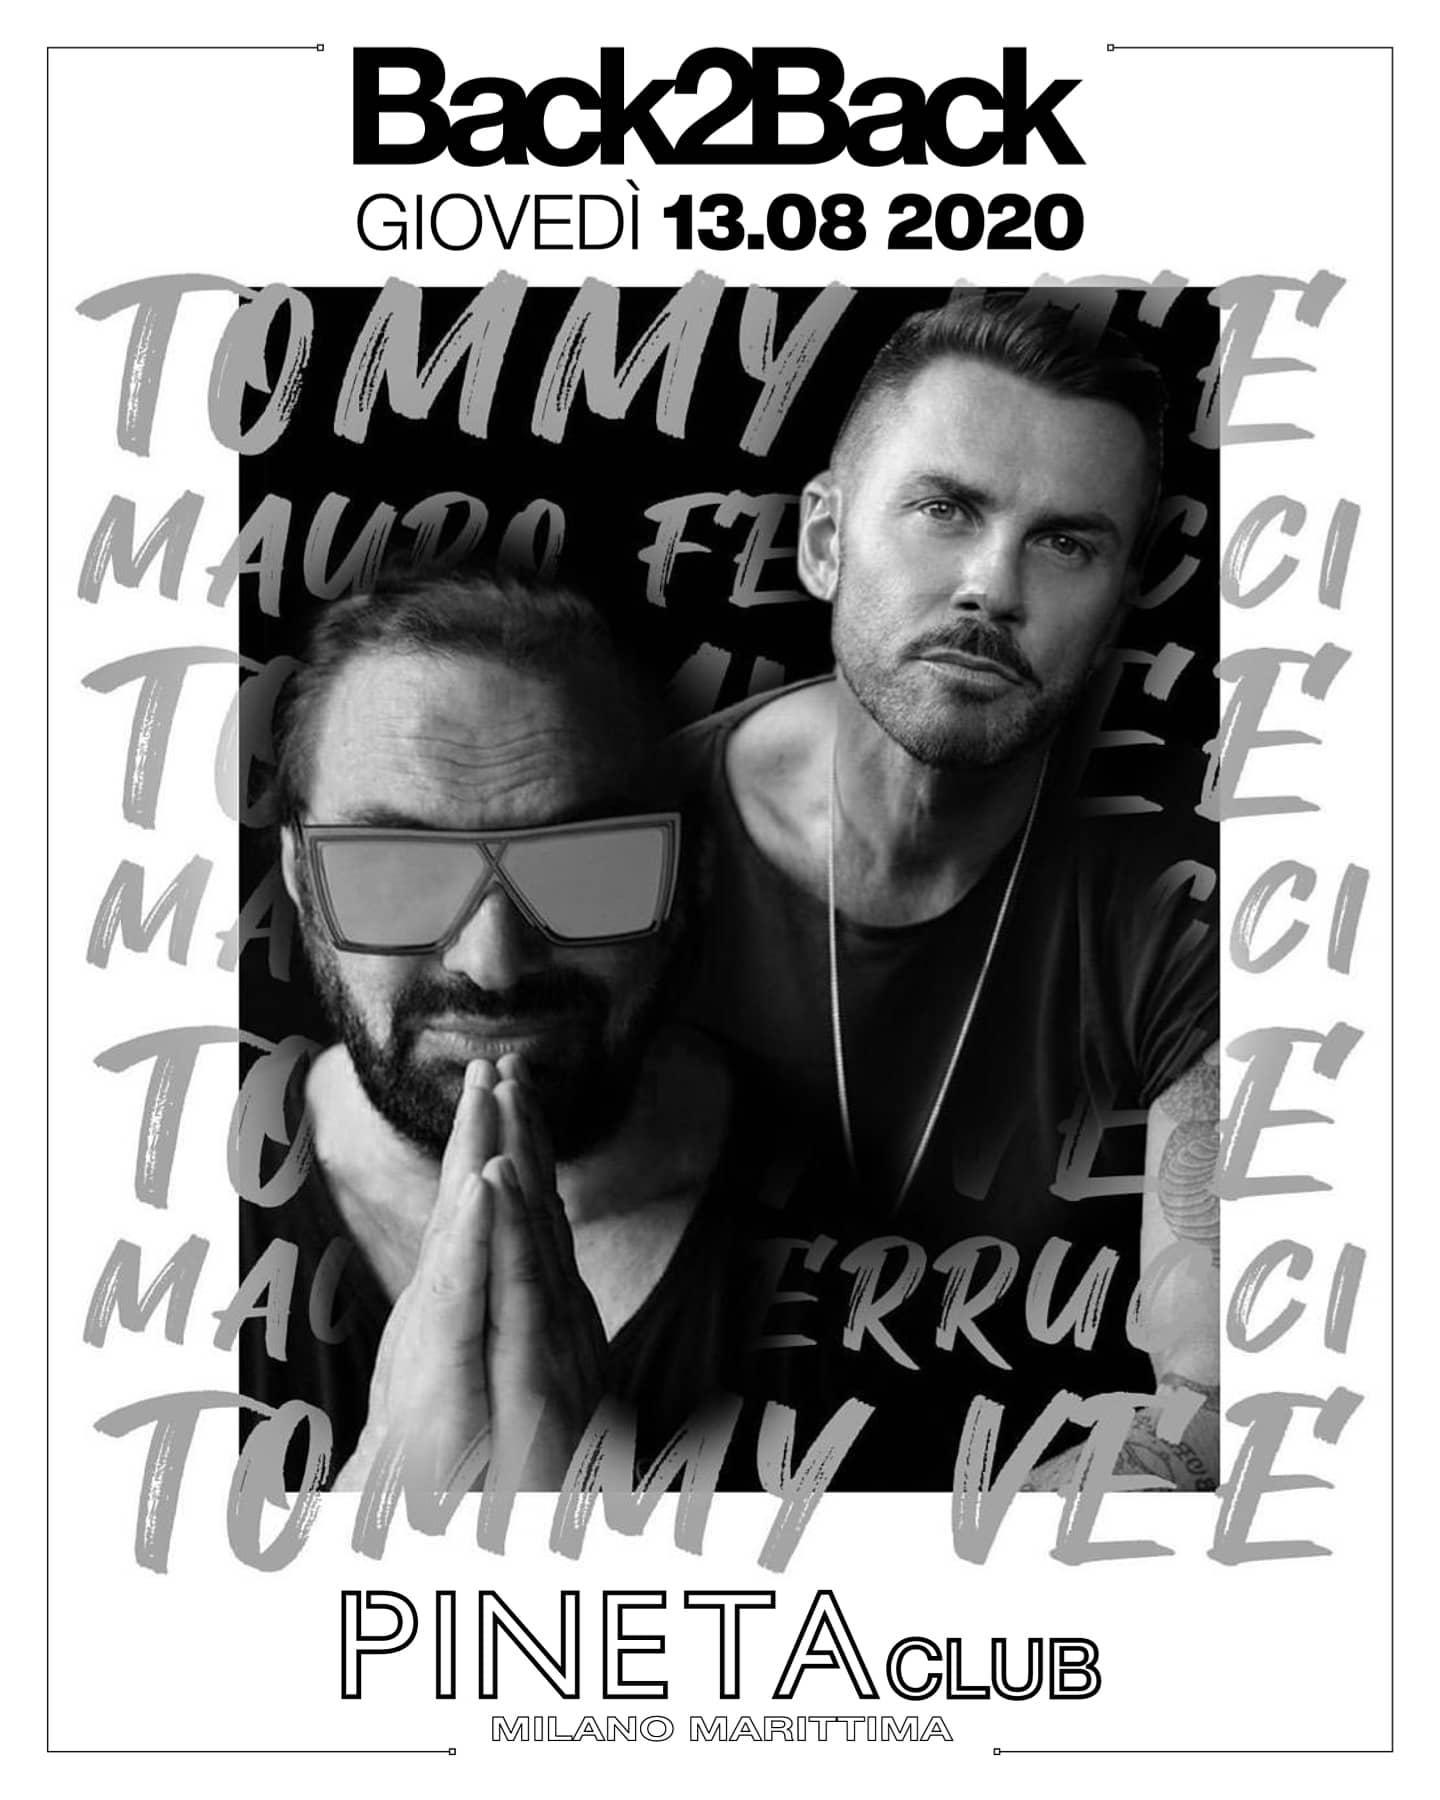 Discoteca Pineta Milano Marittima, Back2Back Mauro Ferrucci e Tommy Vee